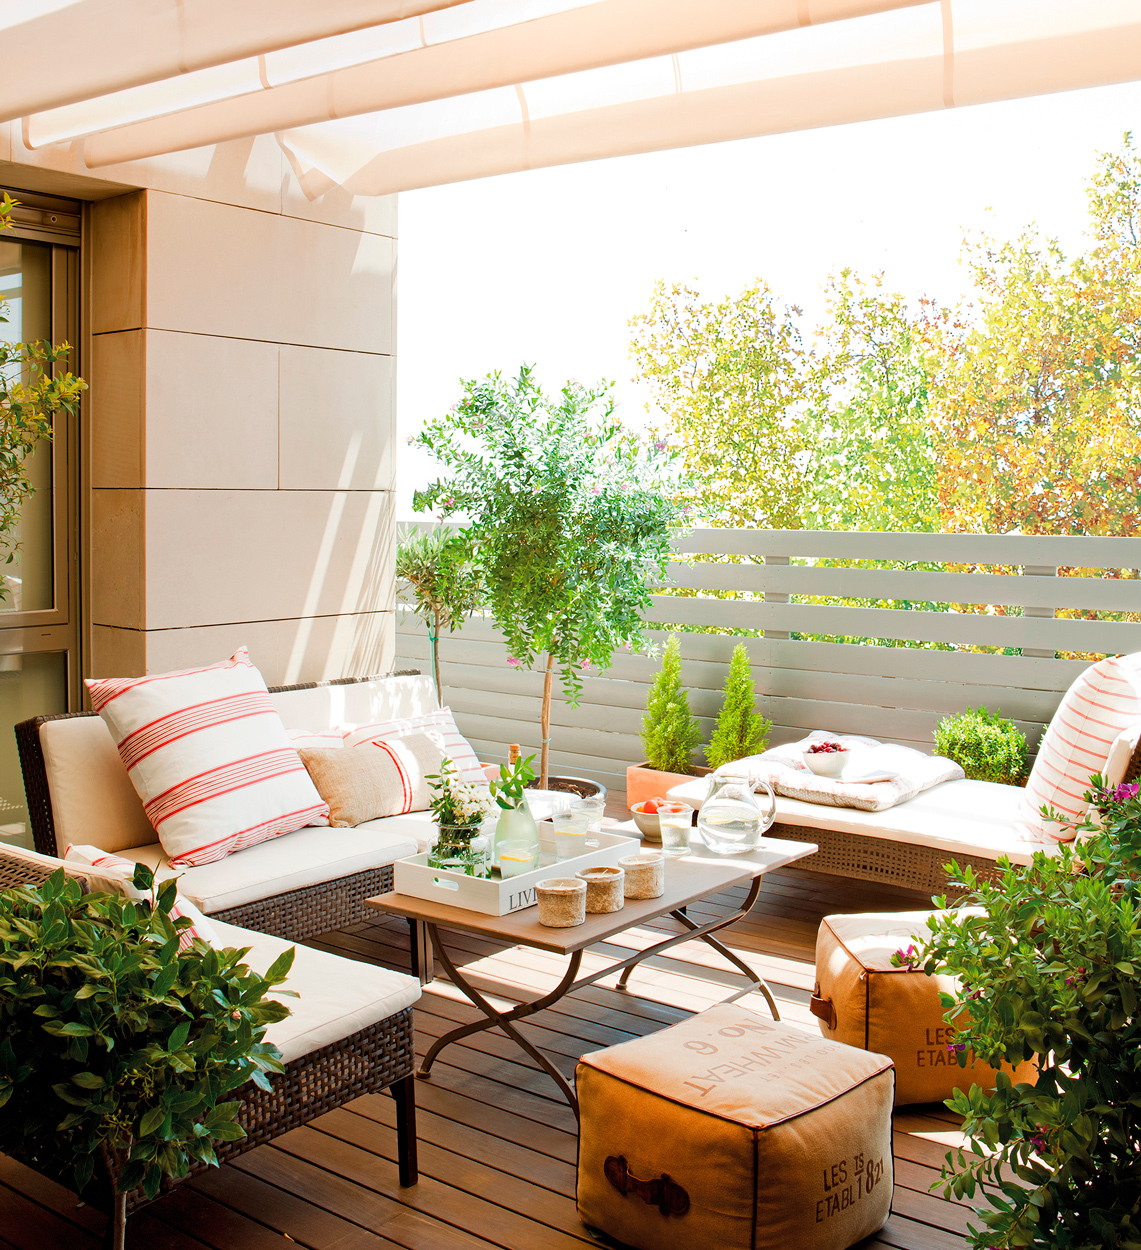 4 interiores conectados con la terraza - Mesas de terrazas ...